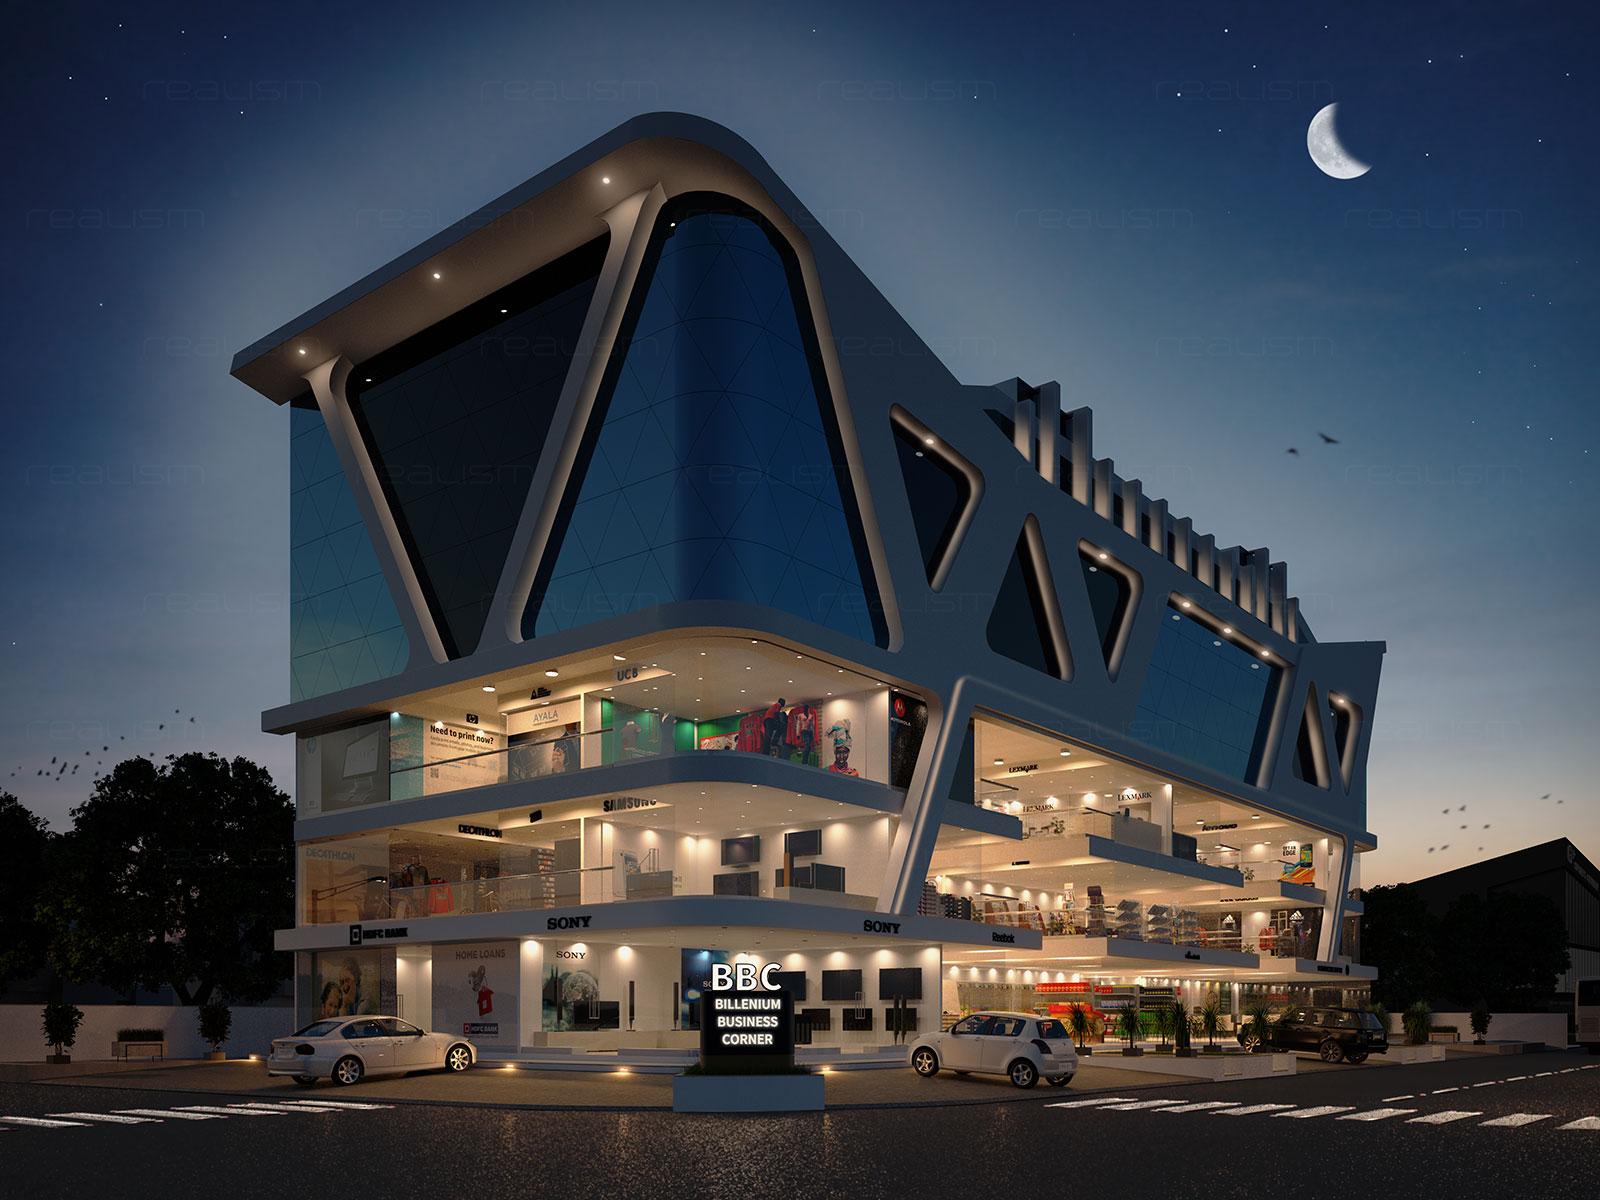 Floor Designs Realism Architectural 3d Exterior Rendering Views